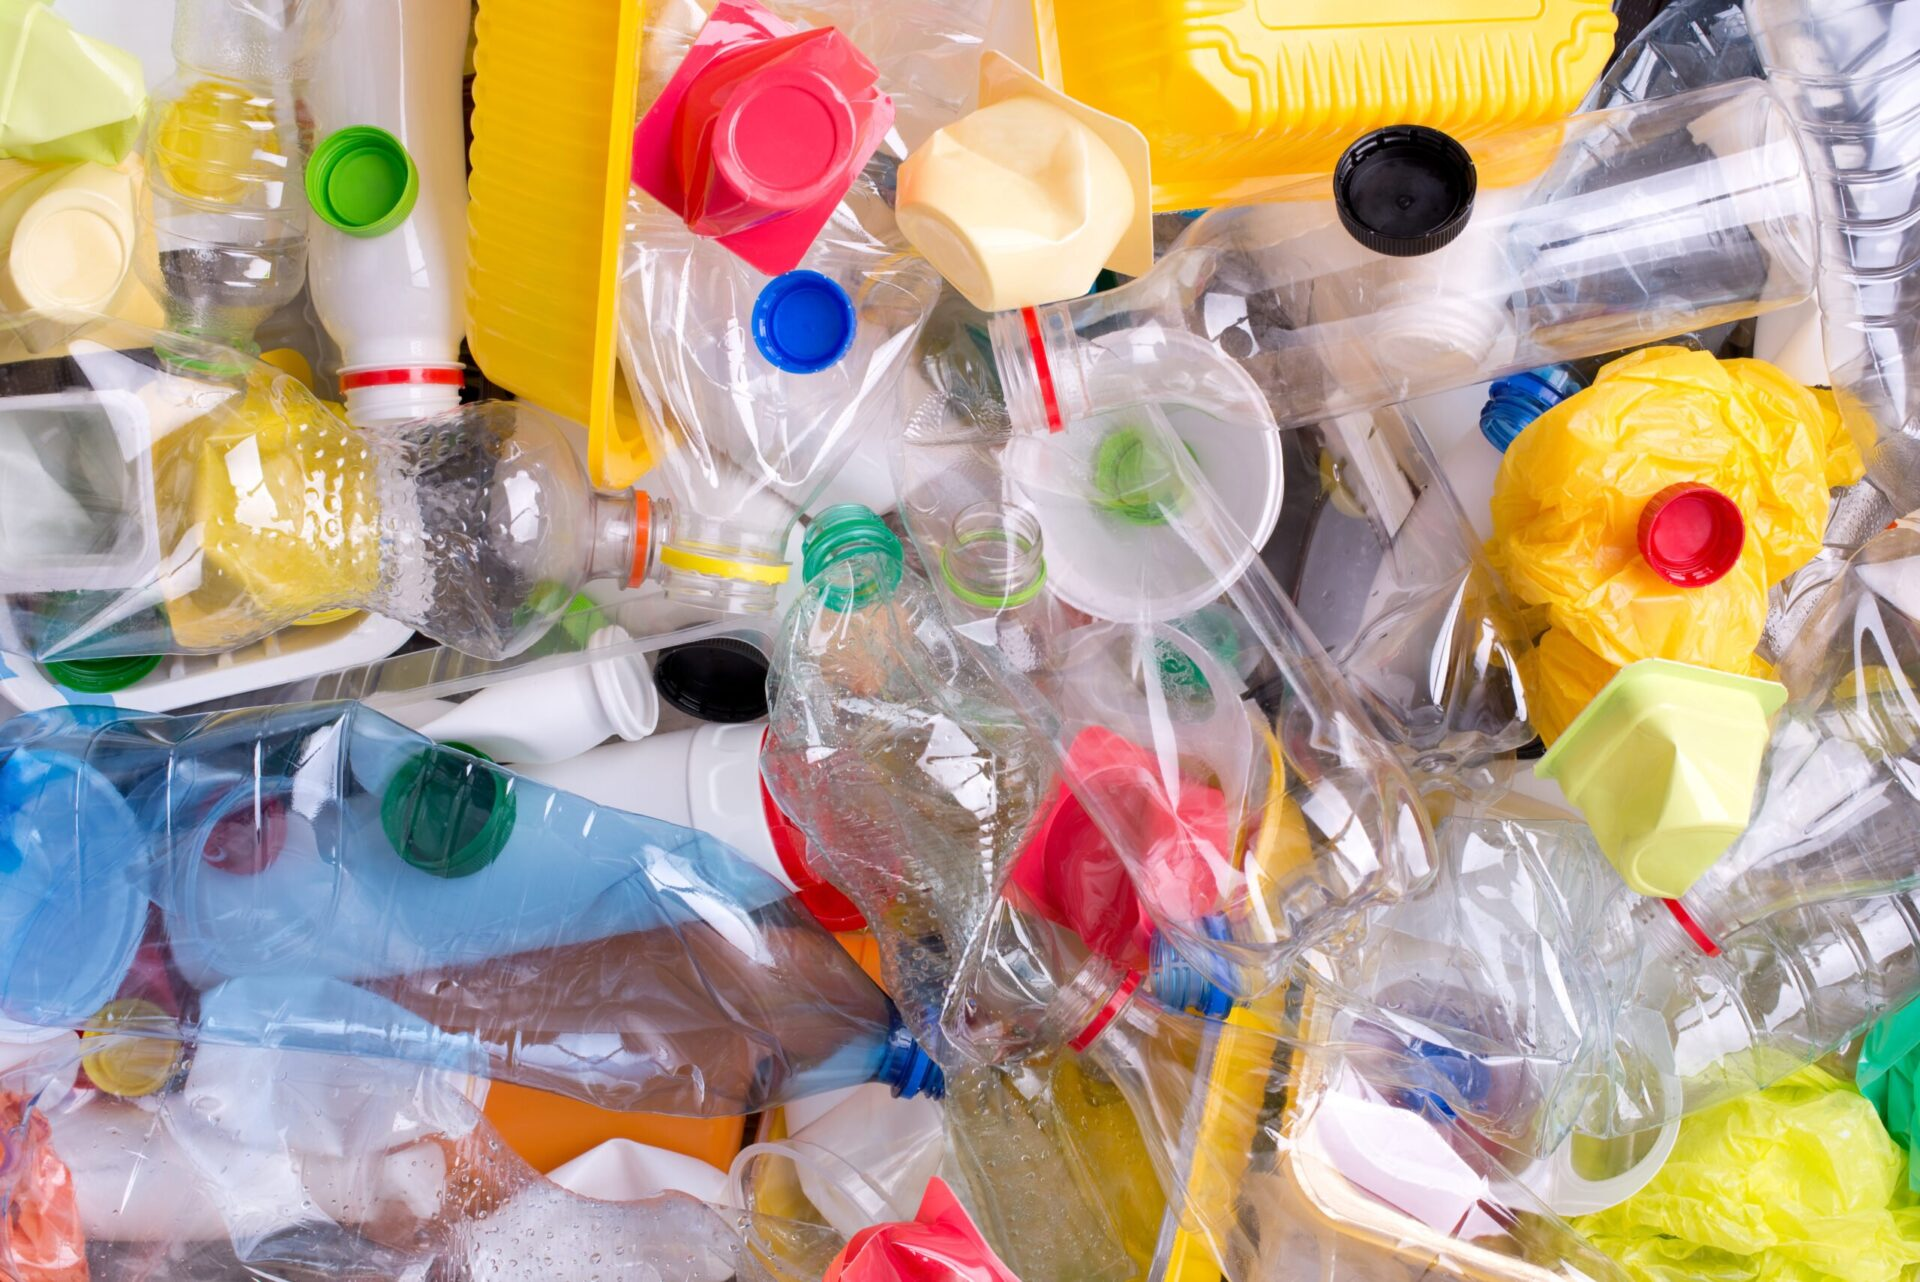 plastics in a landfill